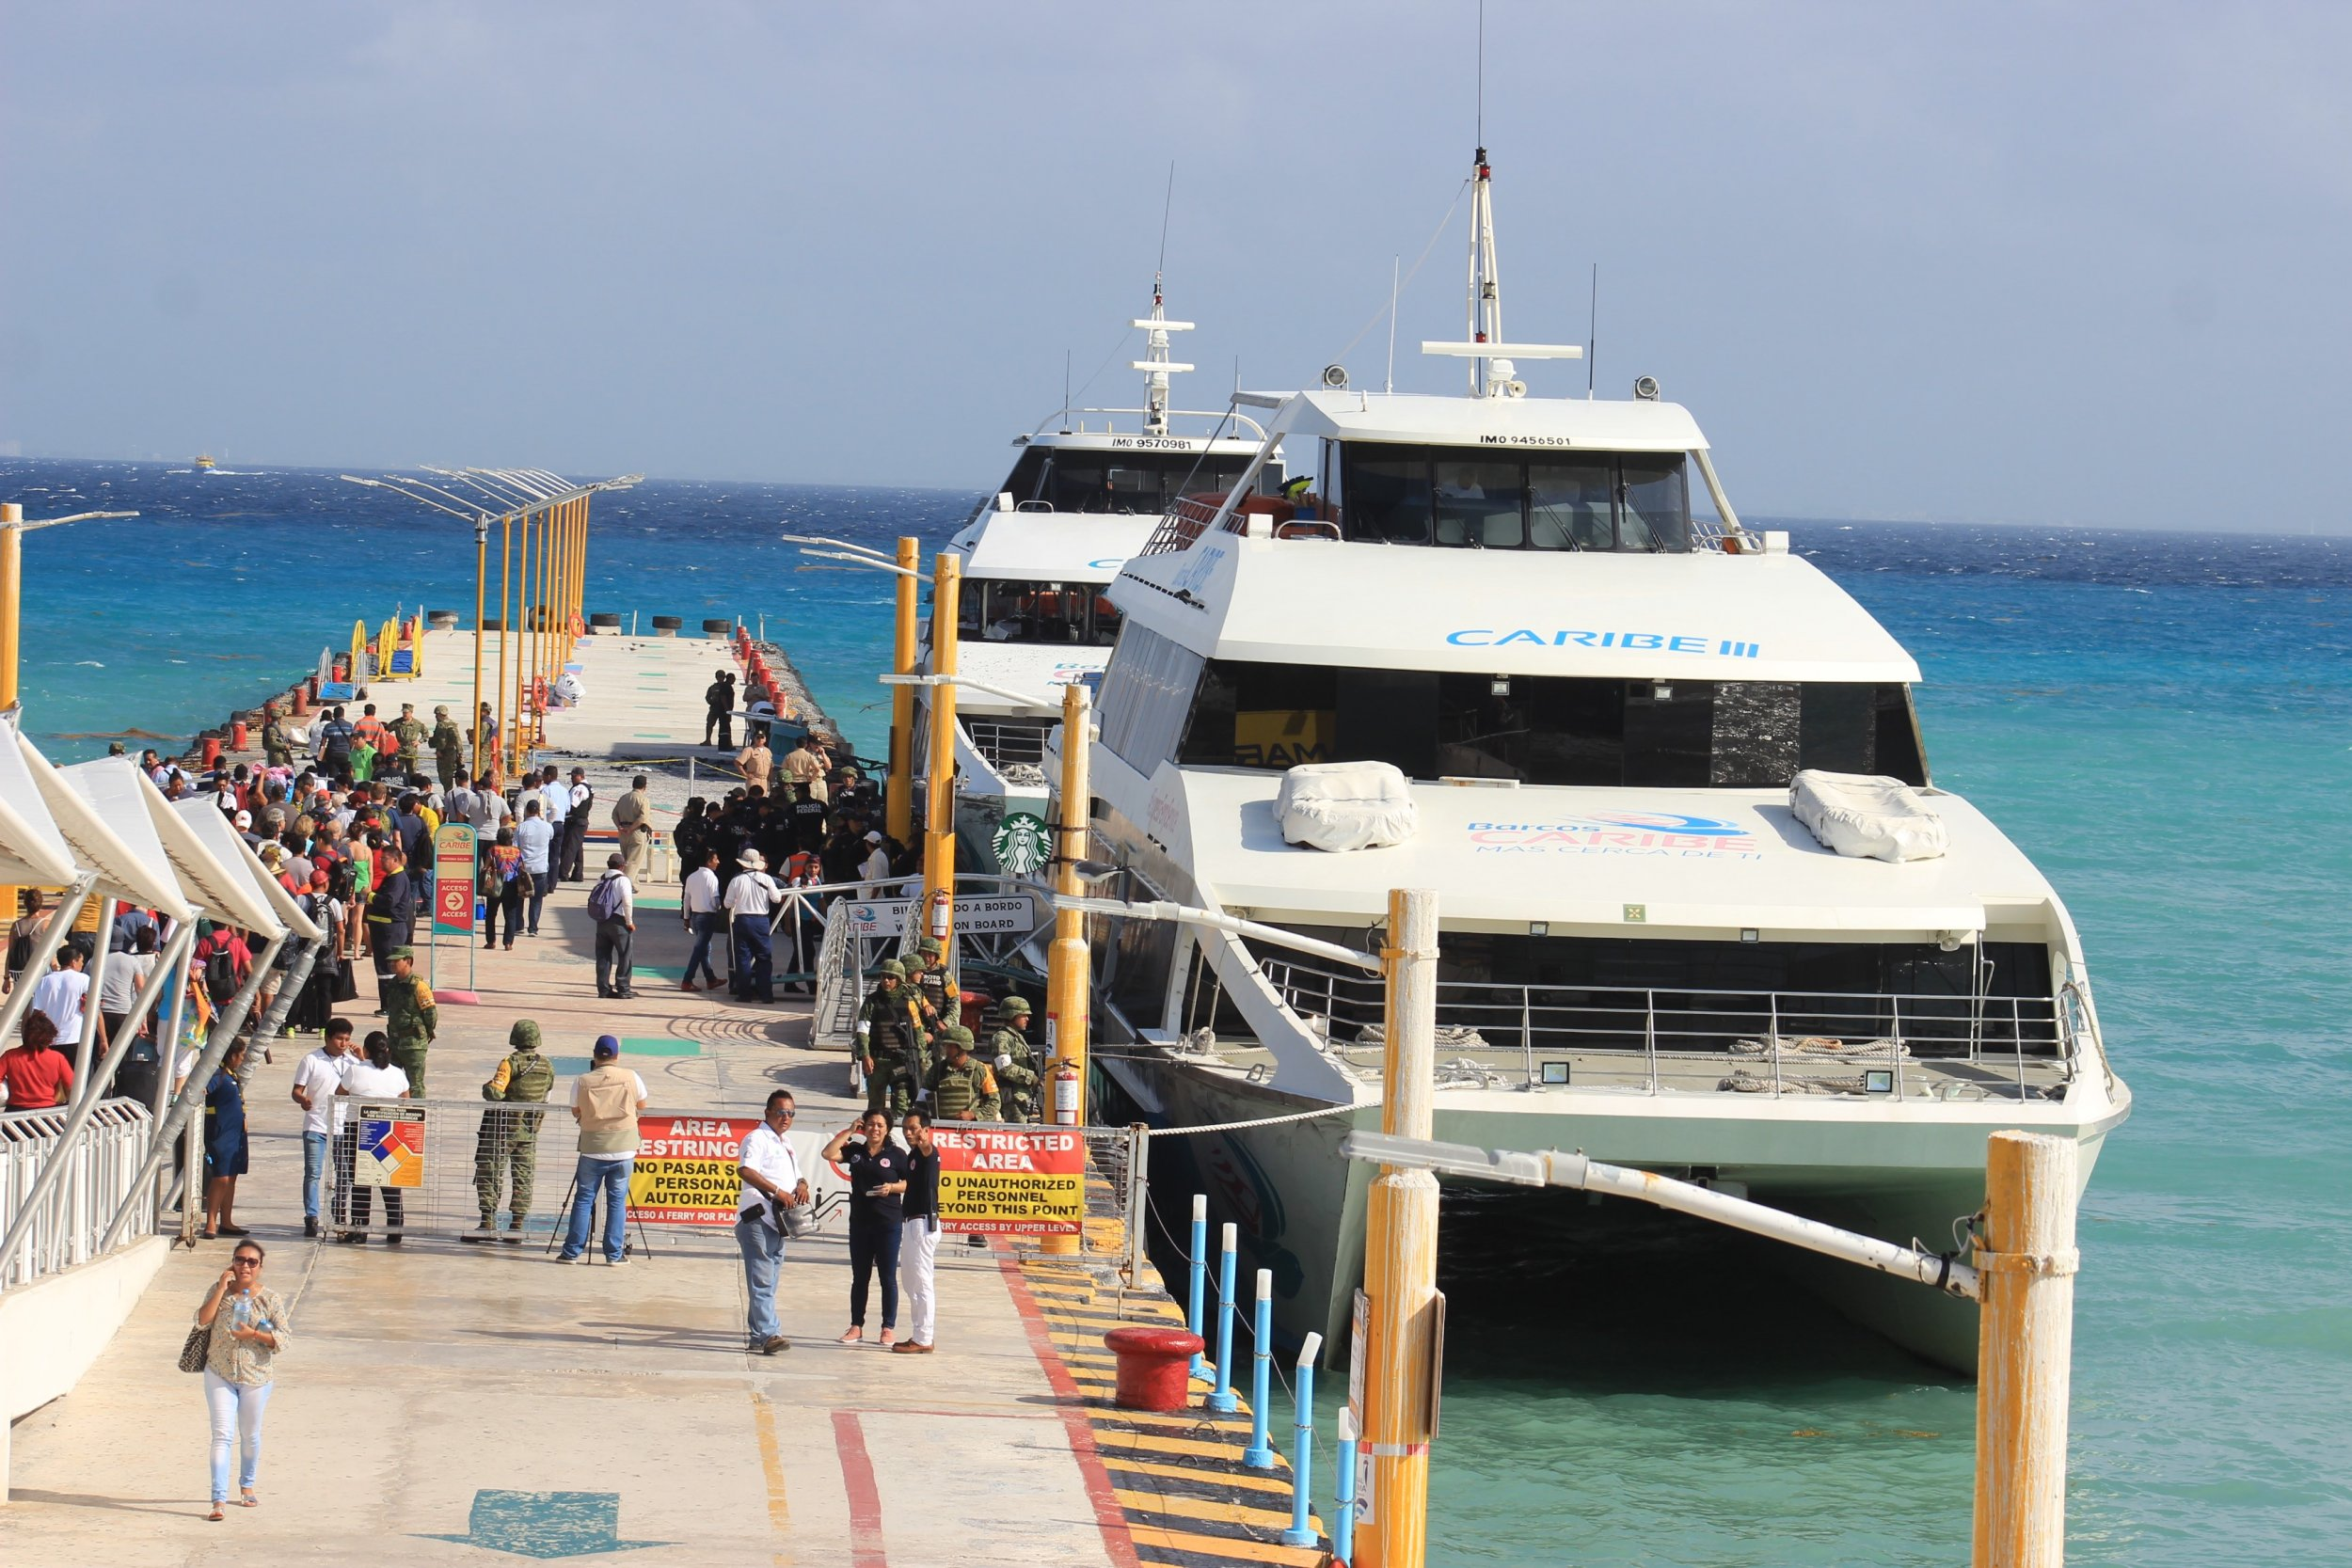 03_08_Mexico_ferry